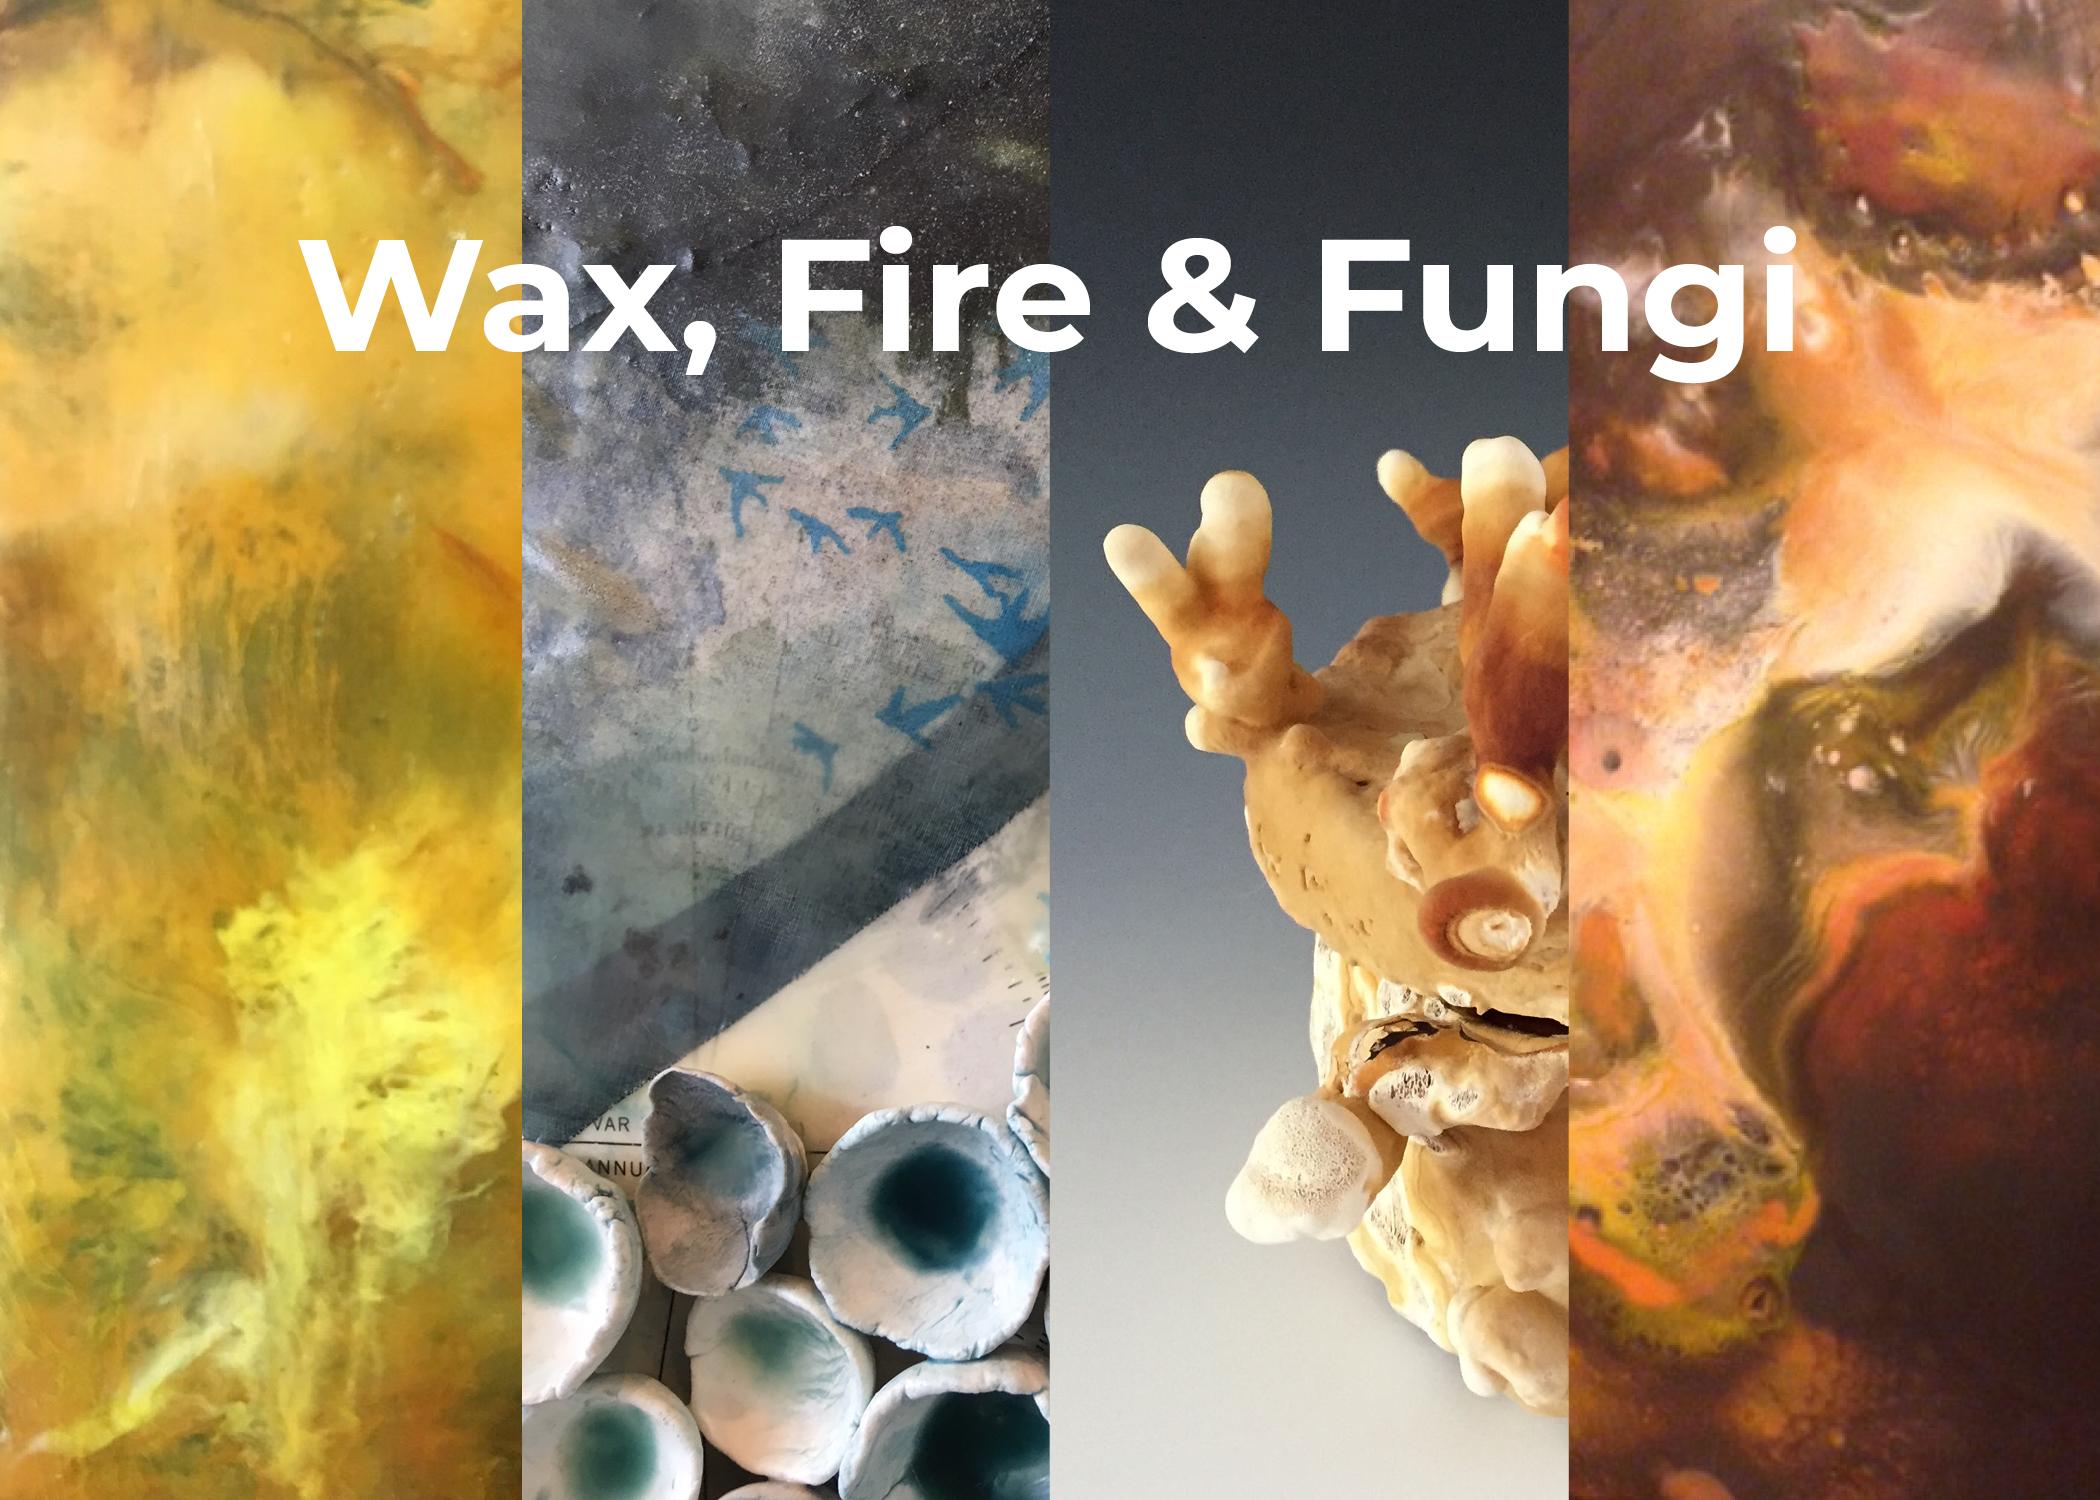 Wax.Fire.Fungi.Postcard.5x7.Yellow.jpg